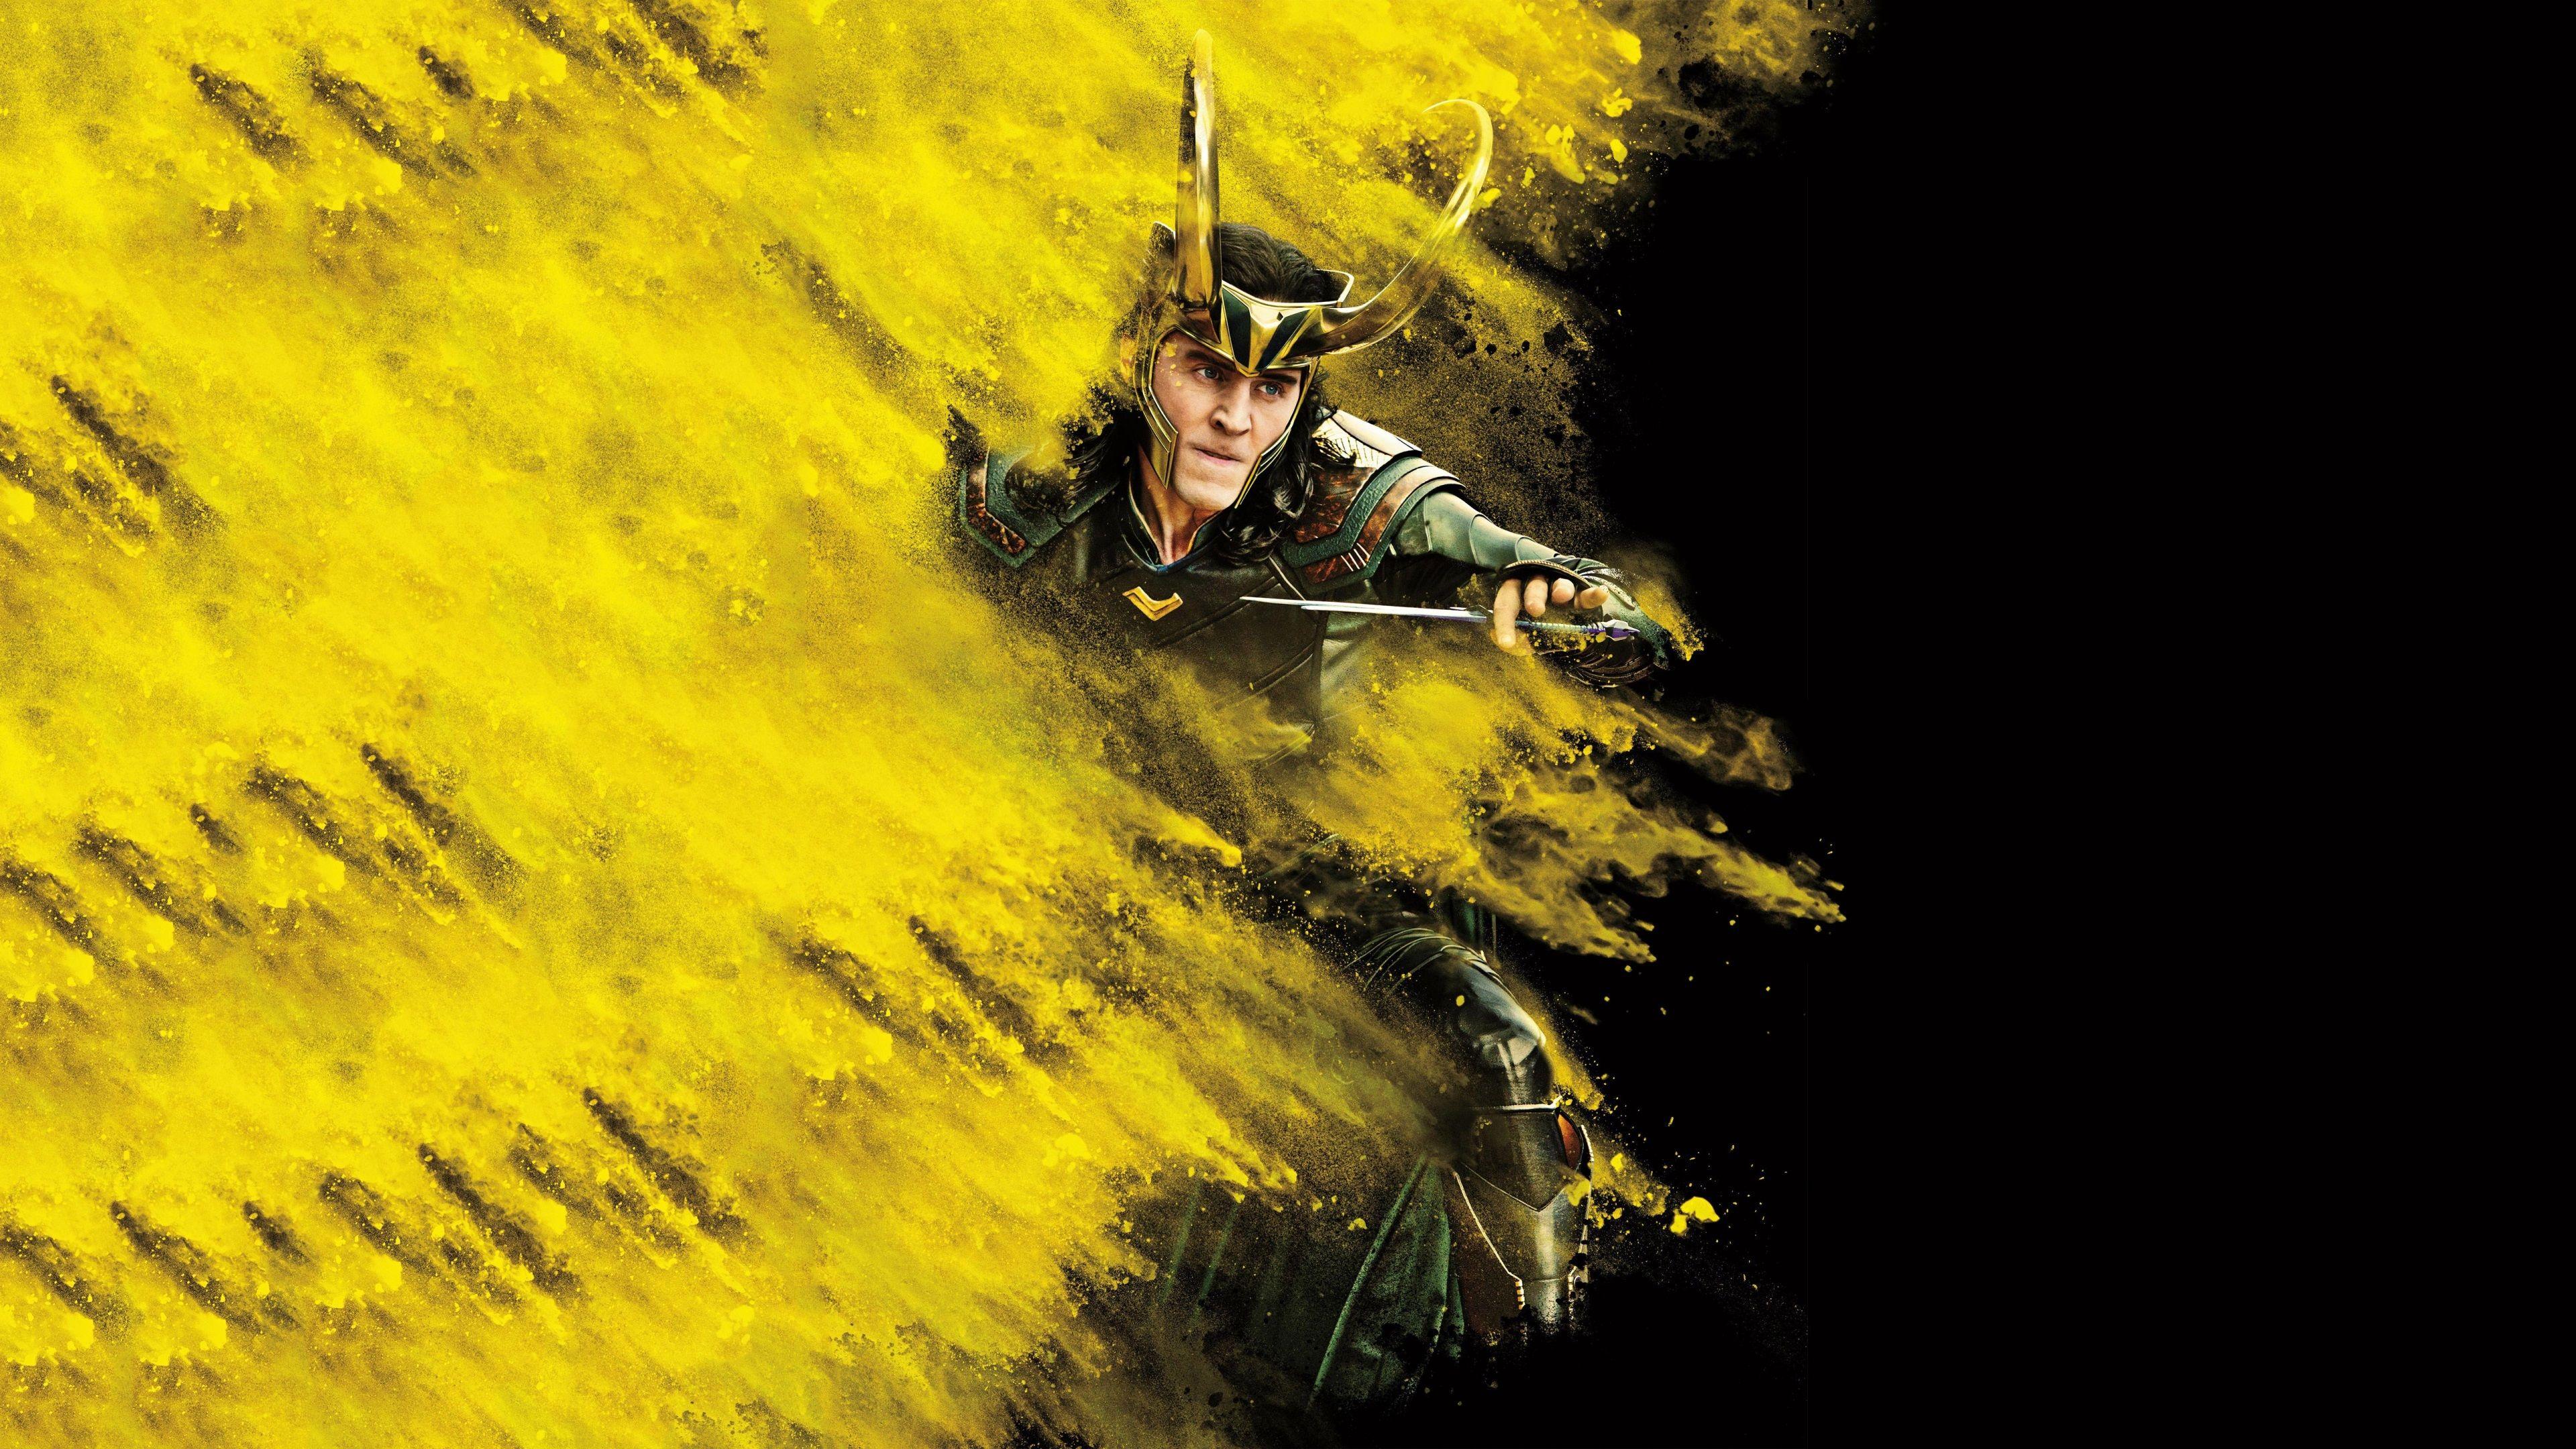 3840x2160 thor ragnarok 4k full hd wallpaper Loki wallpaper 3840x2160